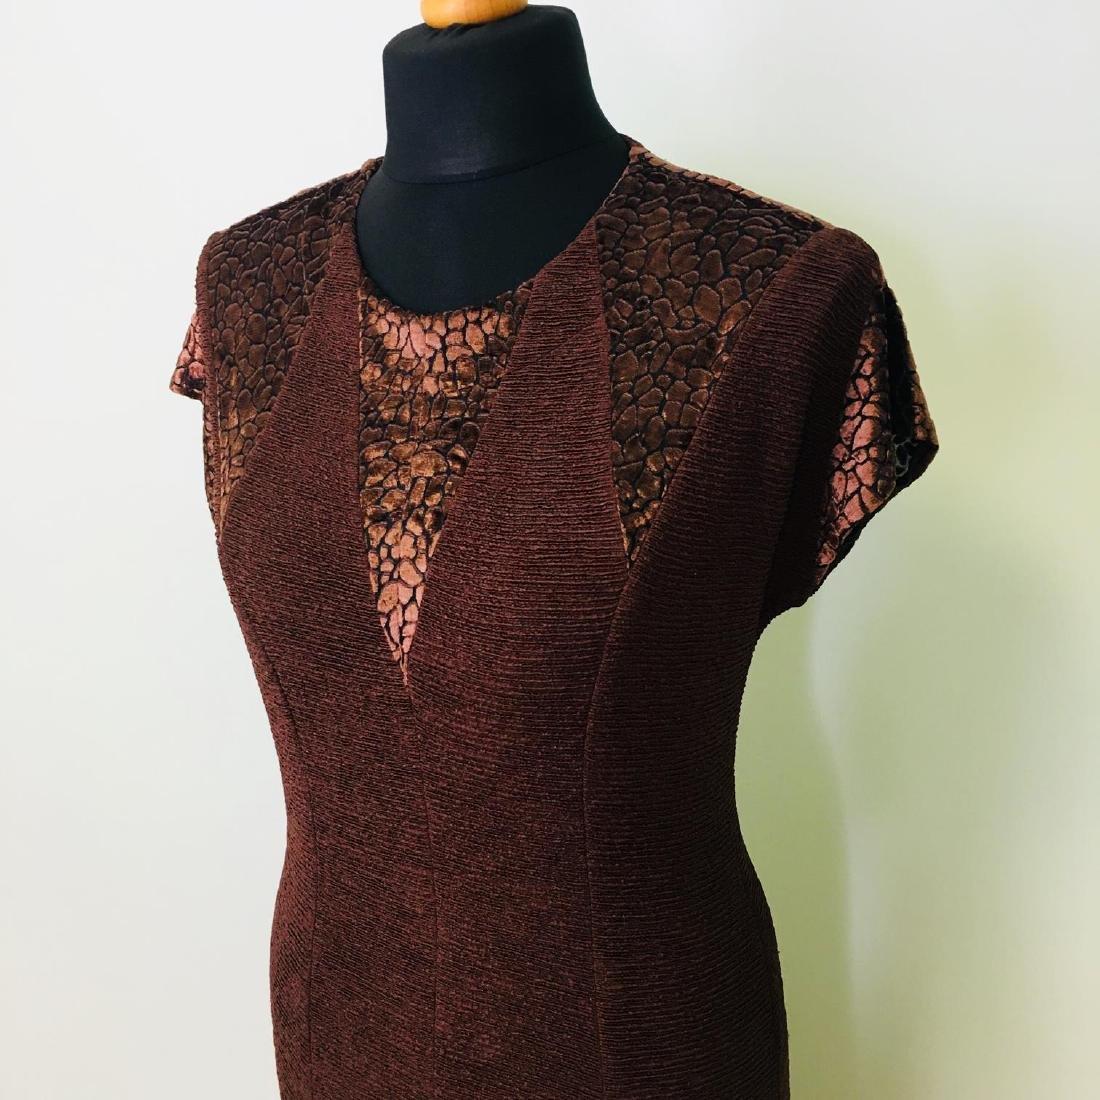 Vintage Women's 2 Piece Evening Jacket Dress Size M - 6